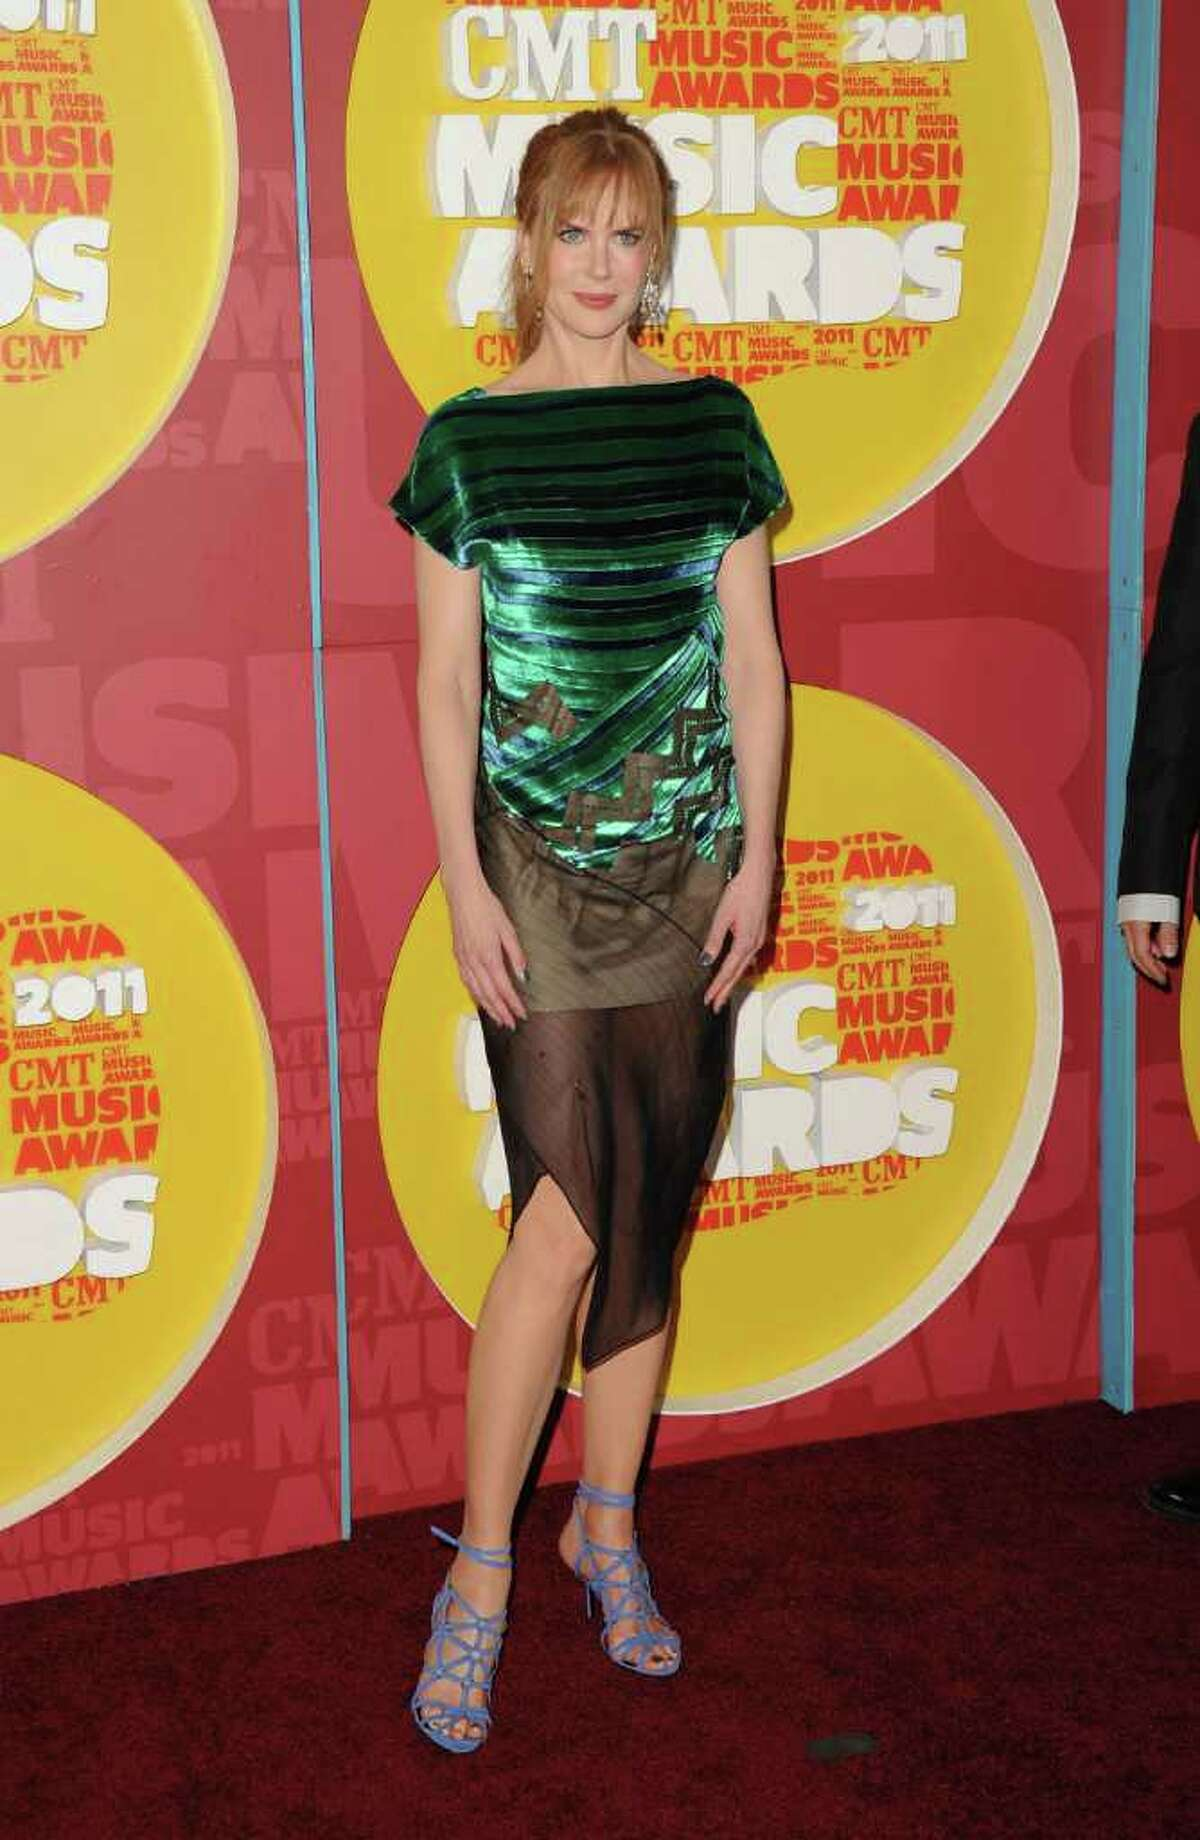 Actress Nicole Kidman attends the 2011 CMT Music Awards at the Bridgestone Arena in Nashville, Tenn., on Wednesday, June 8, 2011.